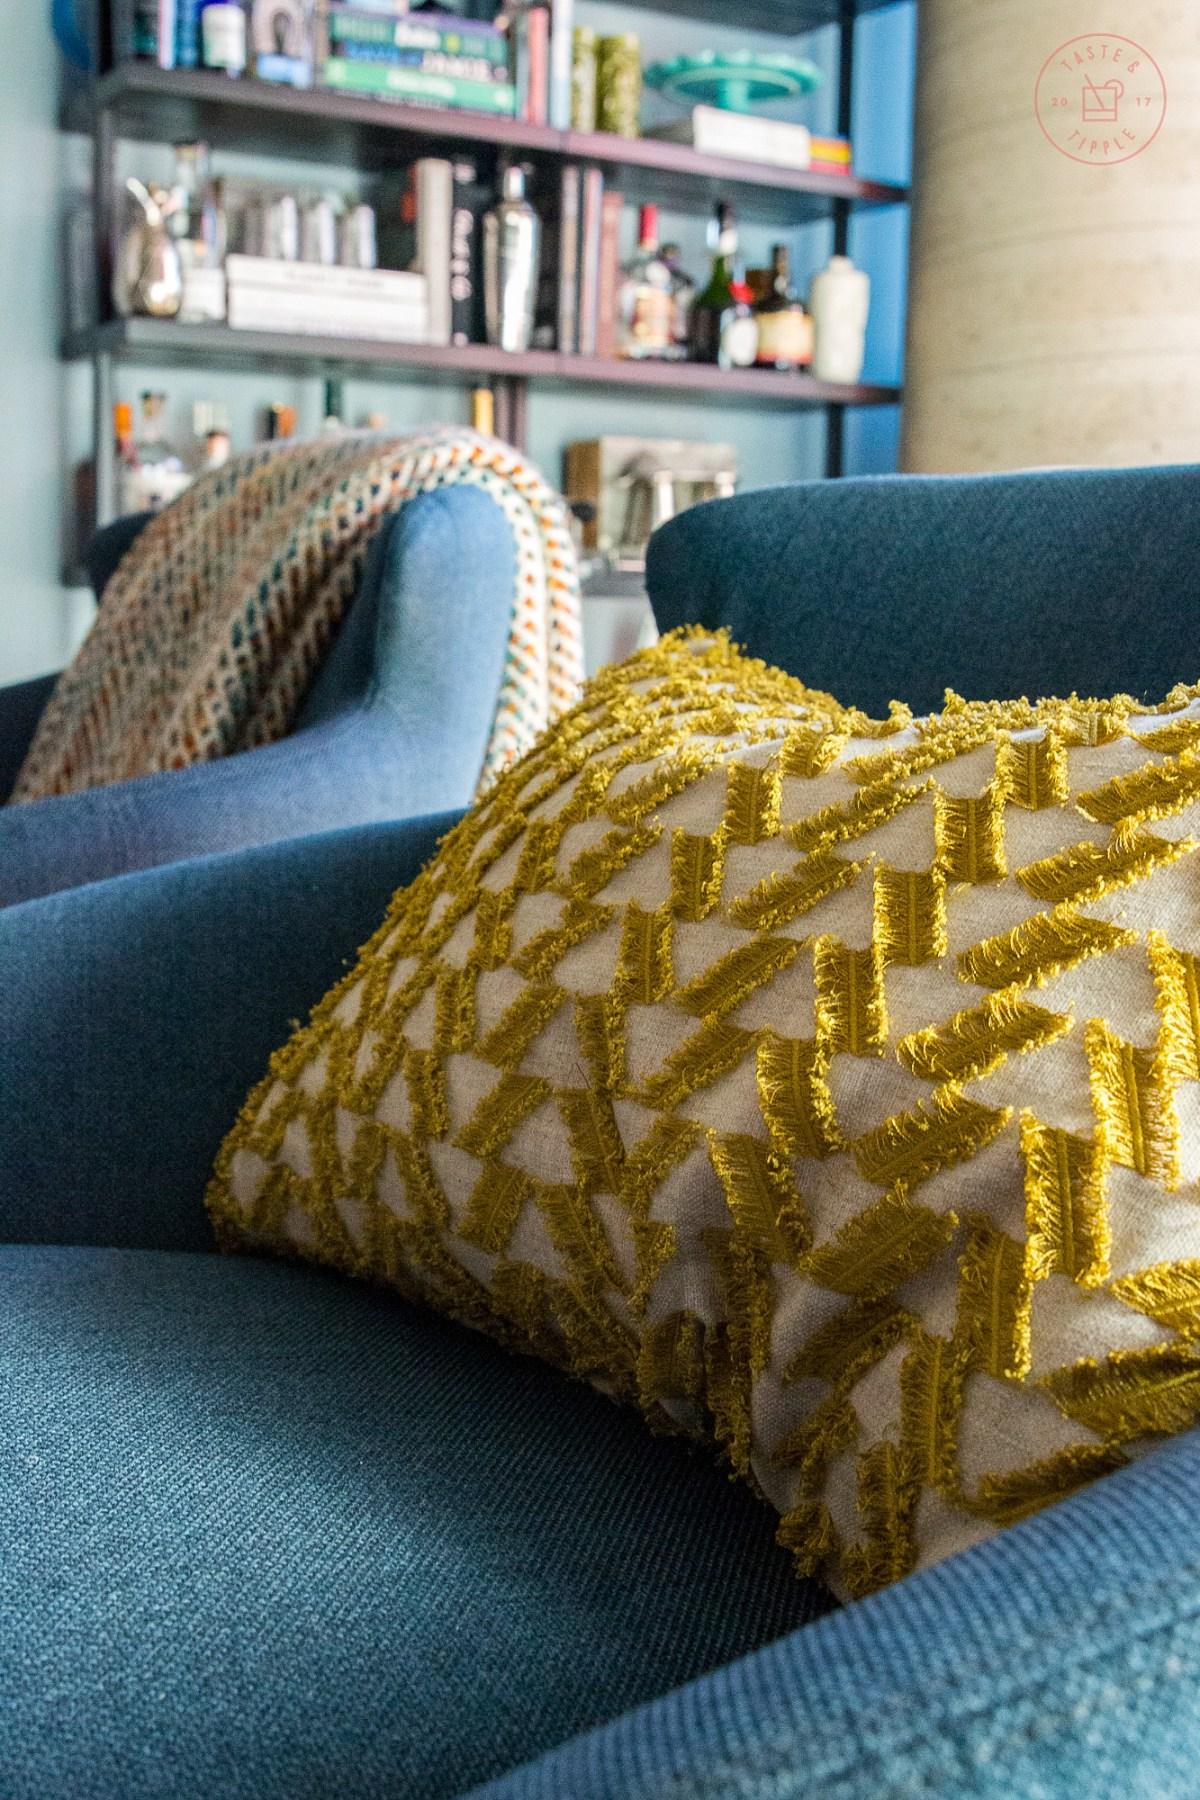 Living Room Reveal | Taste and Tipple